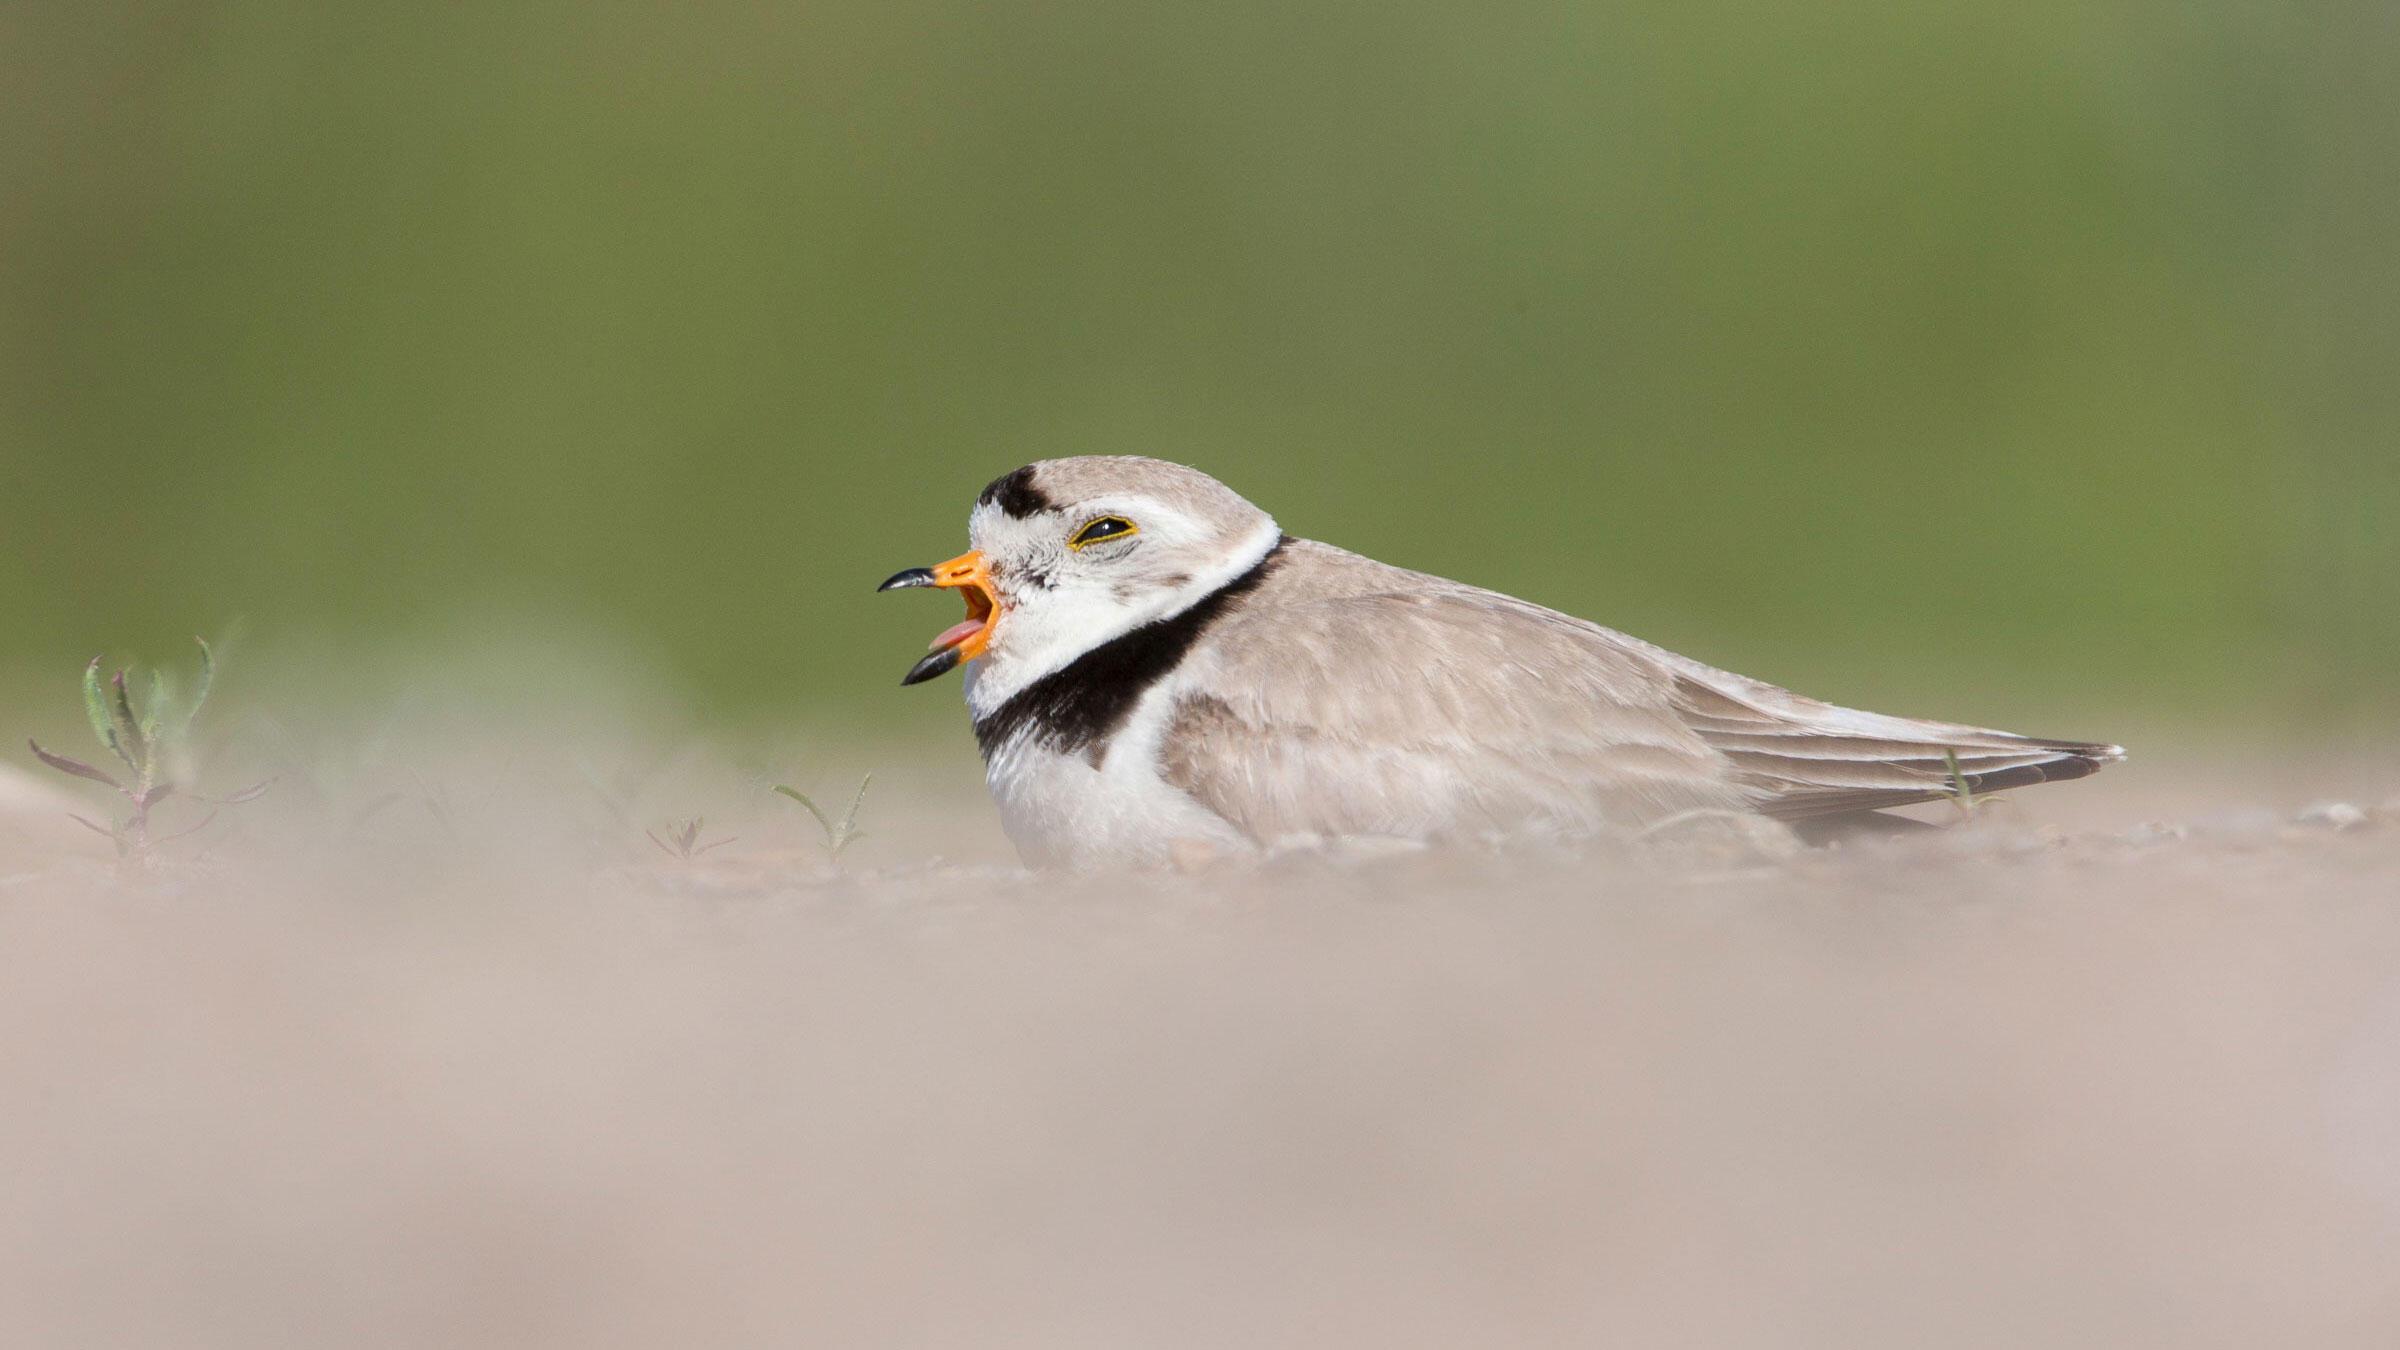 Piping Plover. Barb D'Arpino/Audubon Photography Awards